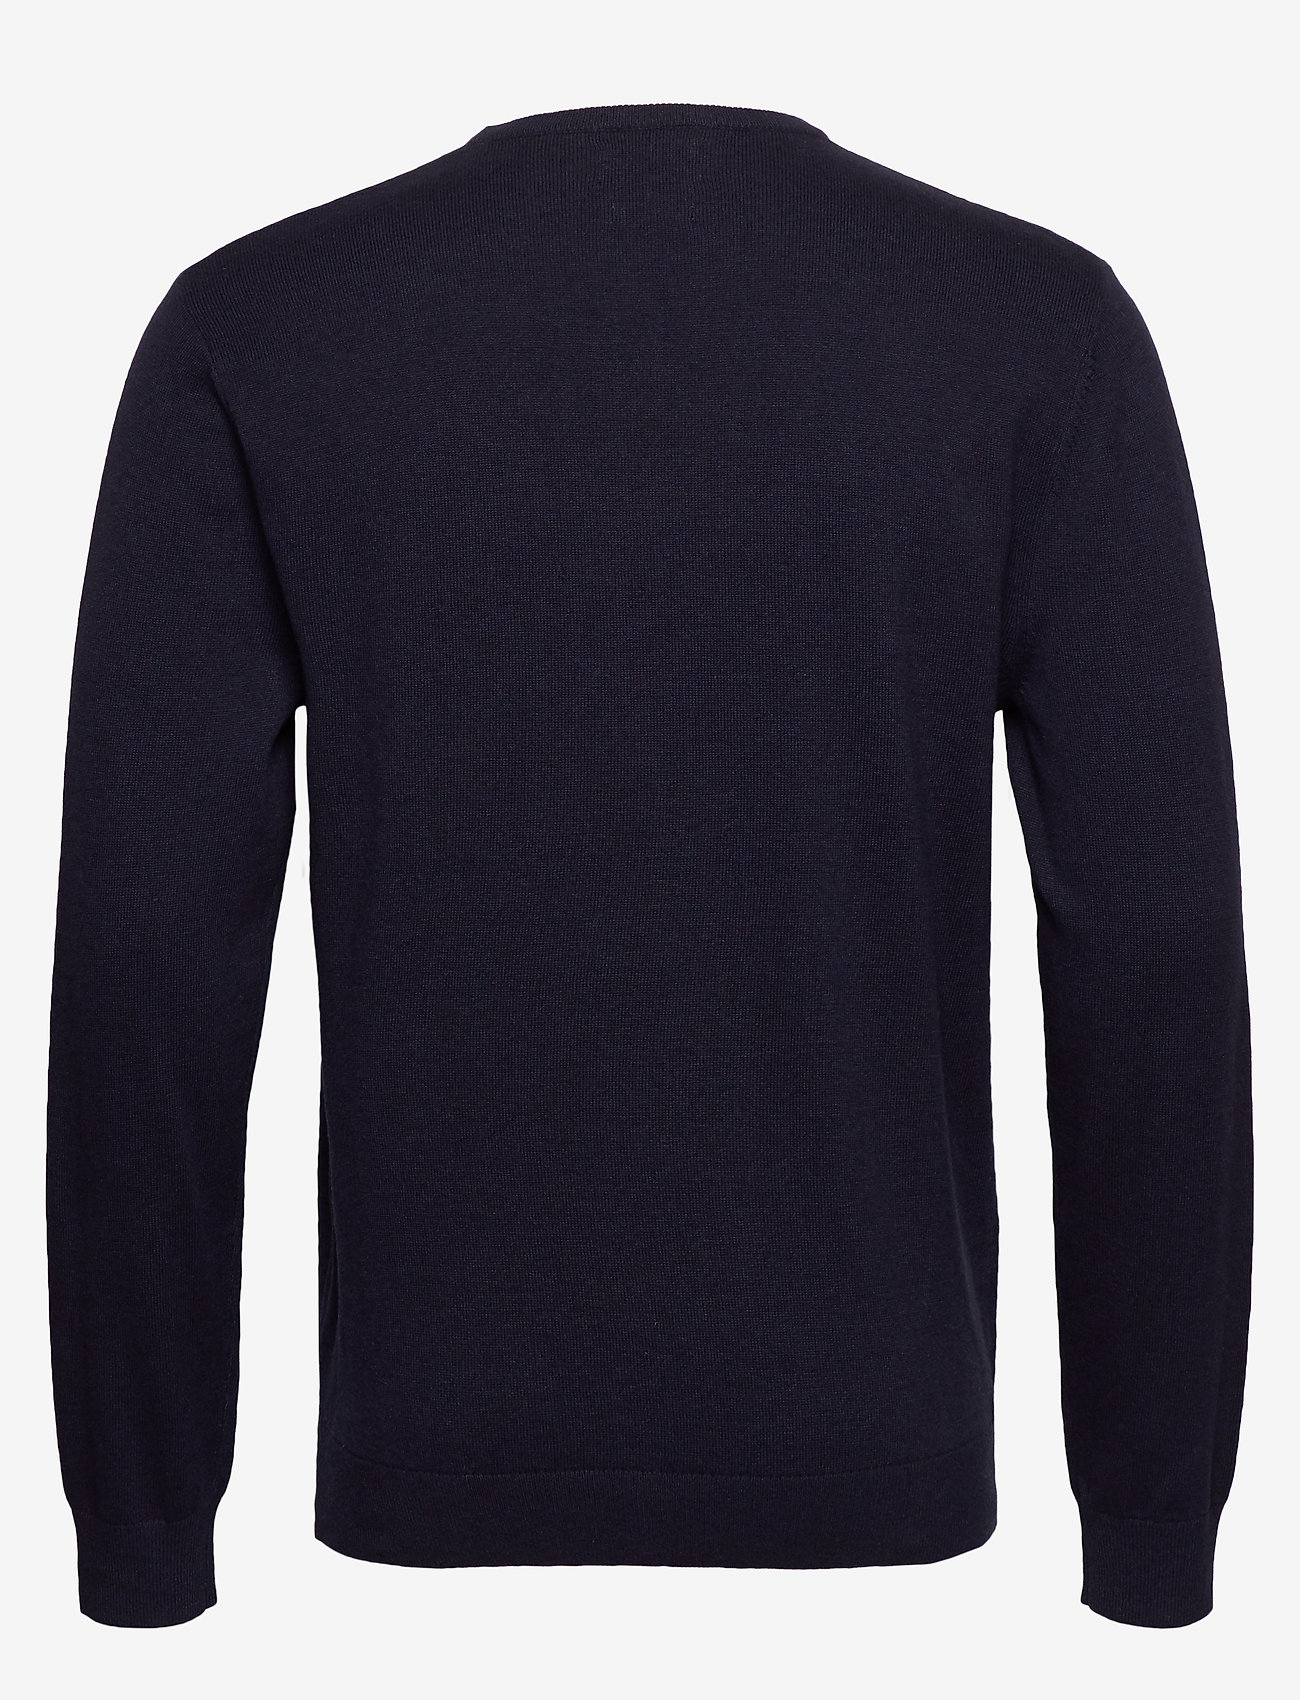 Bradley Crew Neck Sweater (Dark Blue) - Lexington Clothing n9CIXE